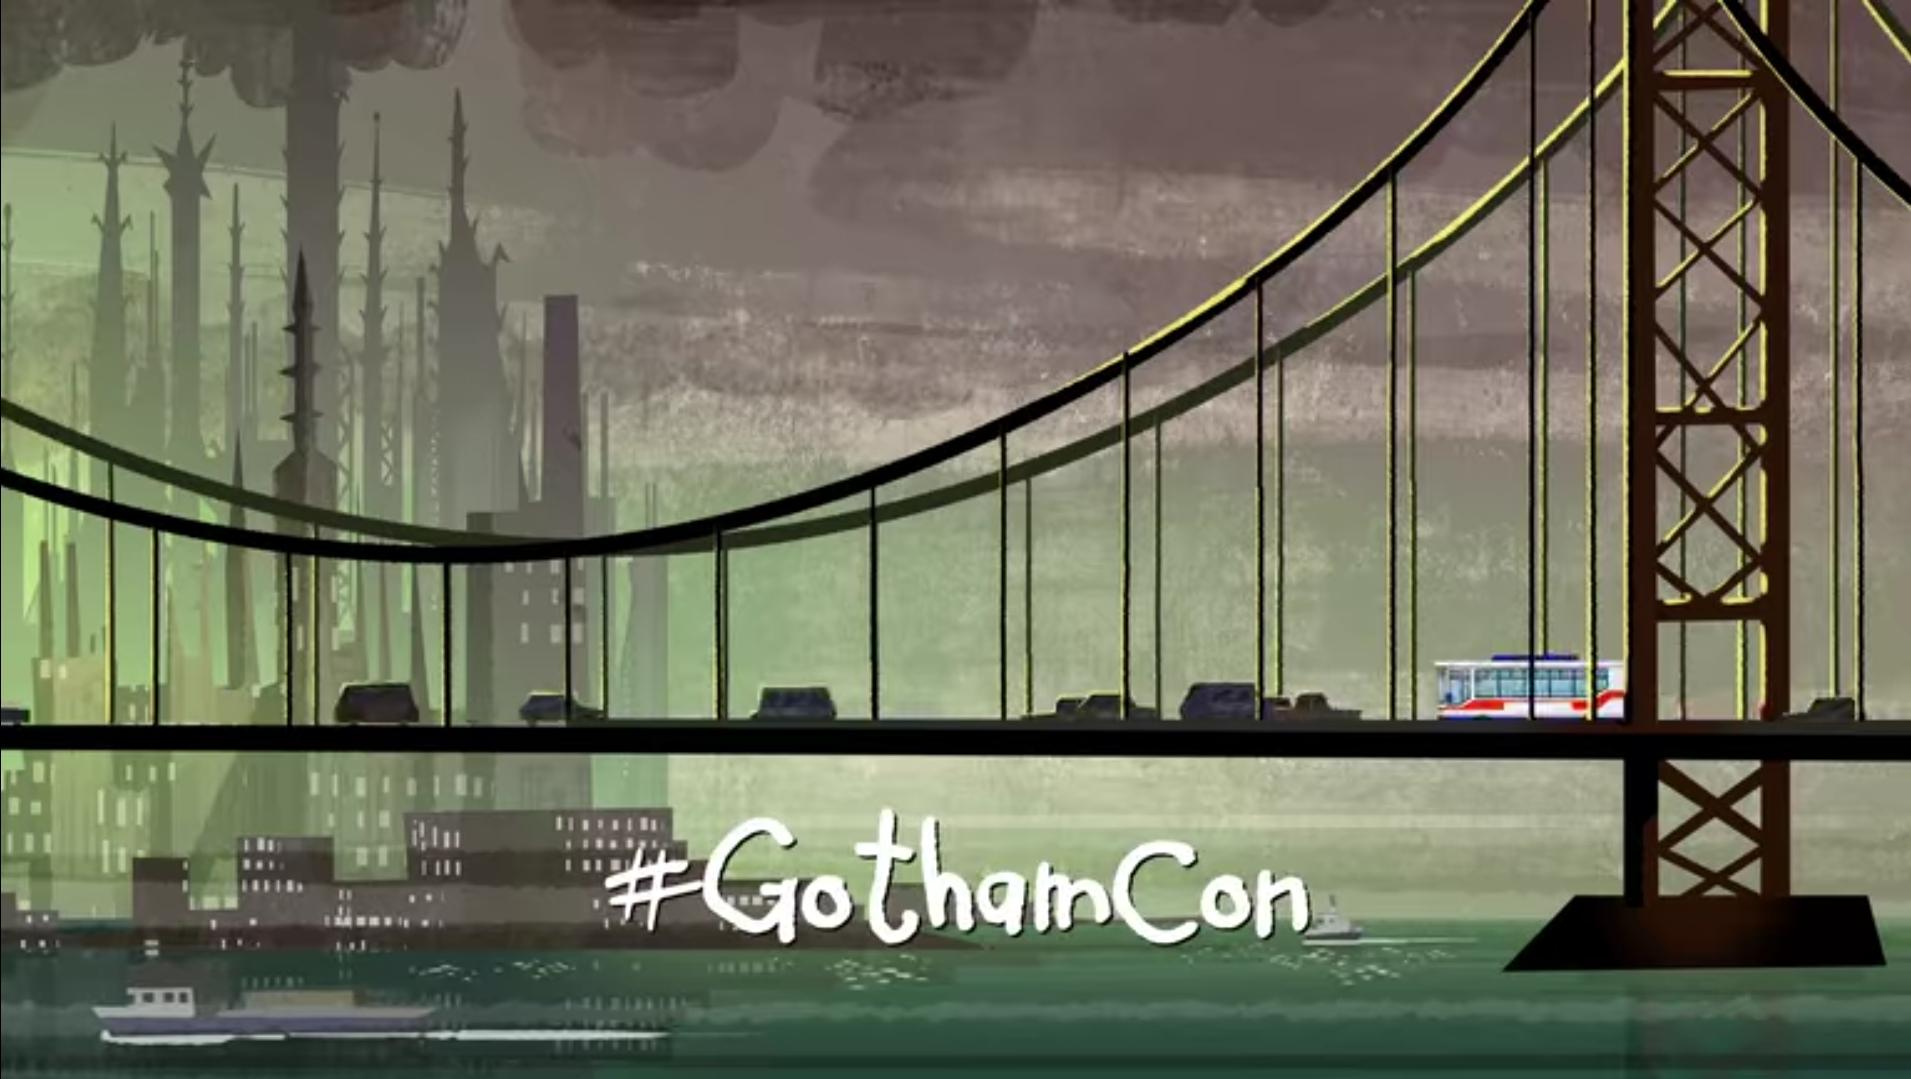 Gotham Con